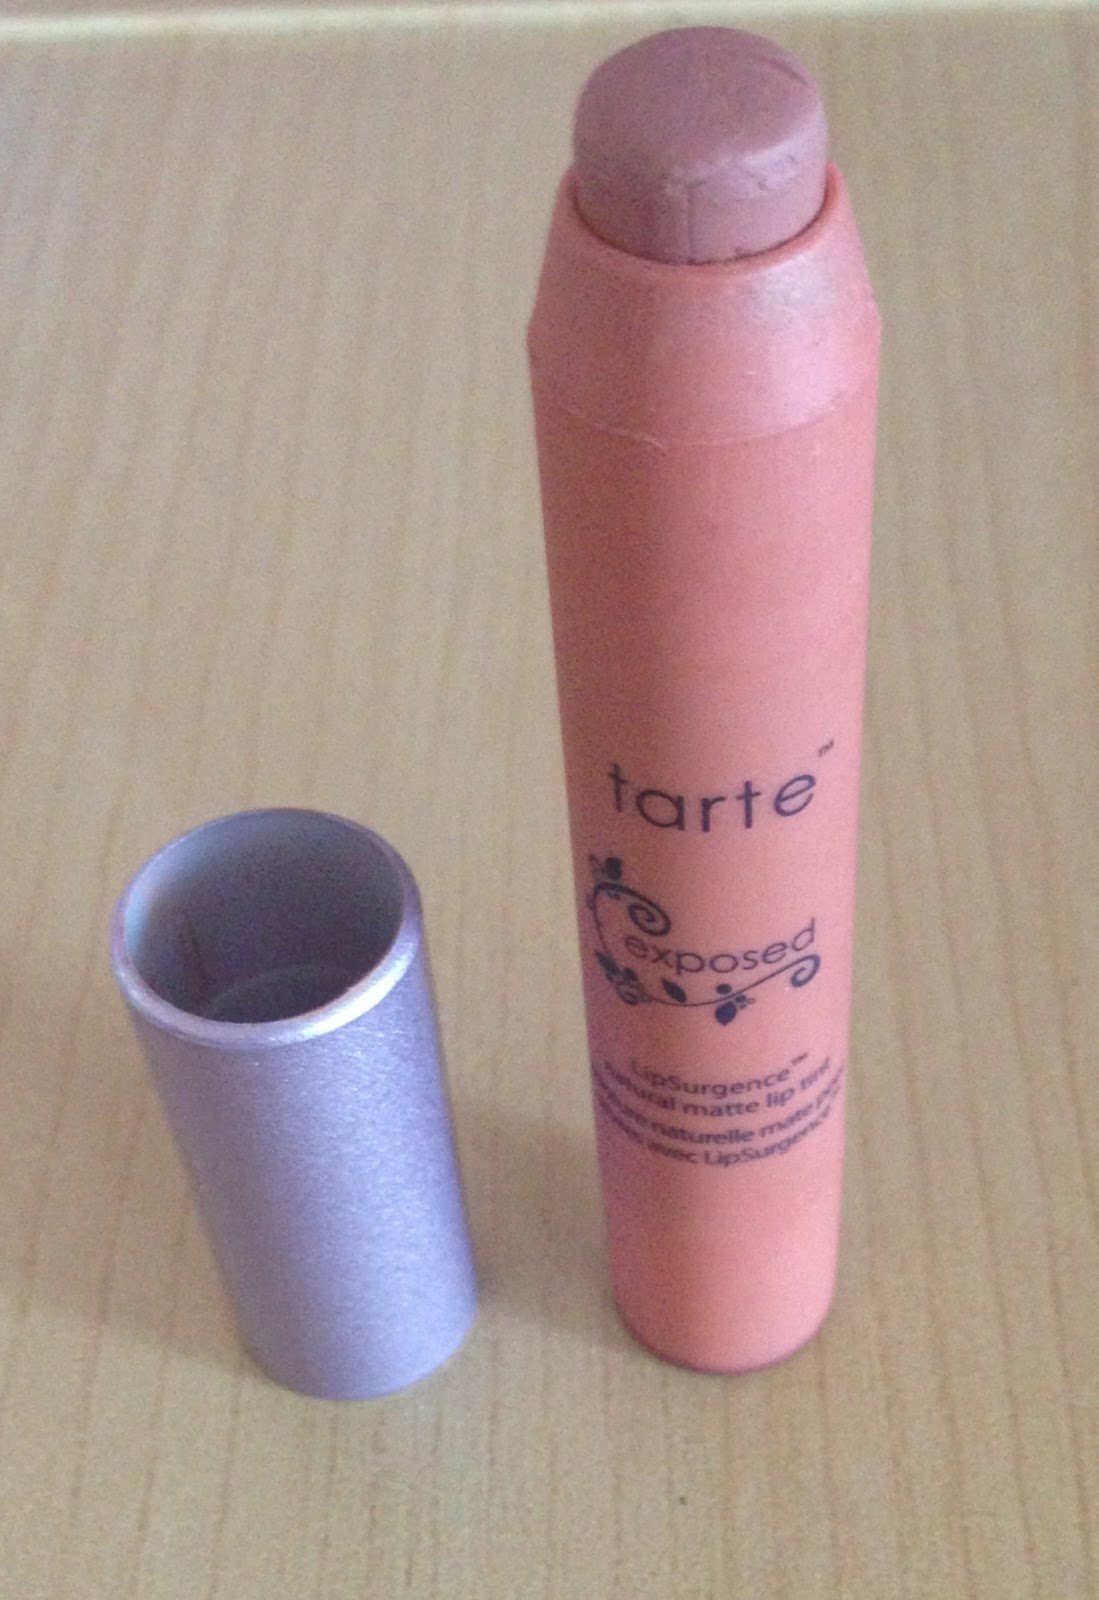 Tarte LipSurgence Natural Matte Lip Tint In Exposed